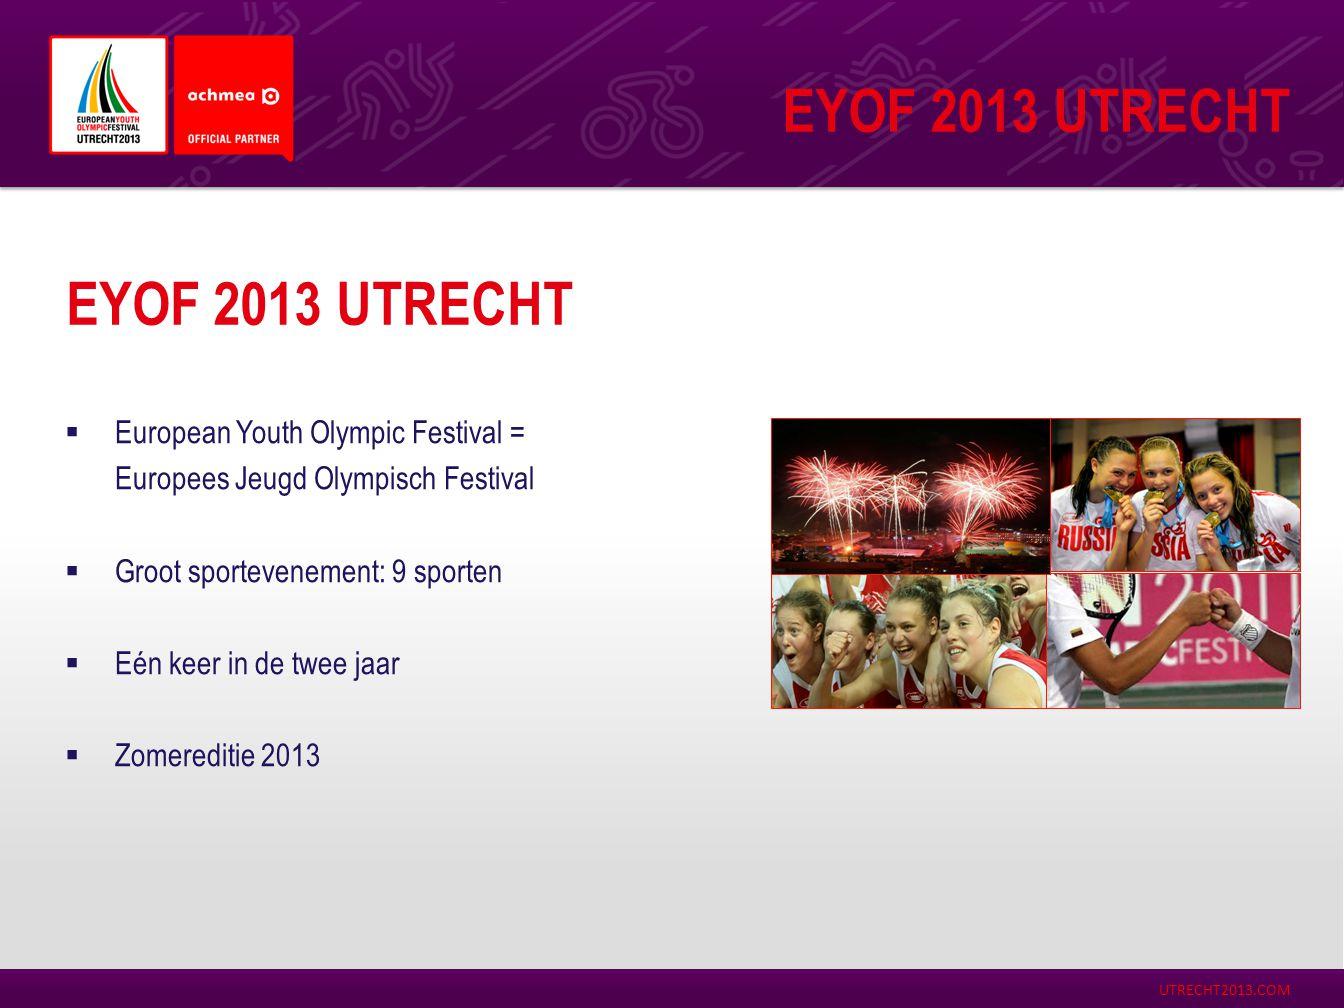 UTRECHT2013.COM EYOF 2013 UTRECHT  European Youth Olympic Festival = Europees Jeugd Olympisch Festival  Groot sportevenement: 9 sporten  Eén keer i